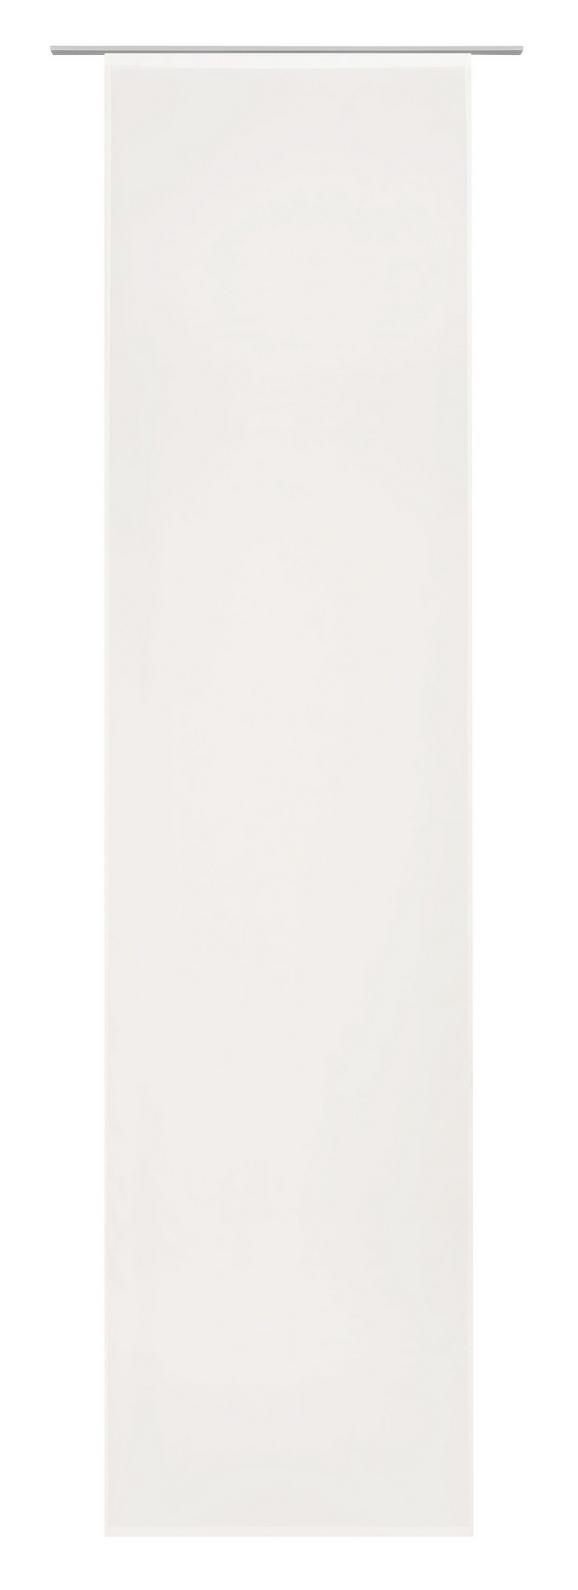 Panelna Zavesa Flipp - krem, tekstil (60/245cm) - Based